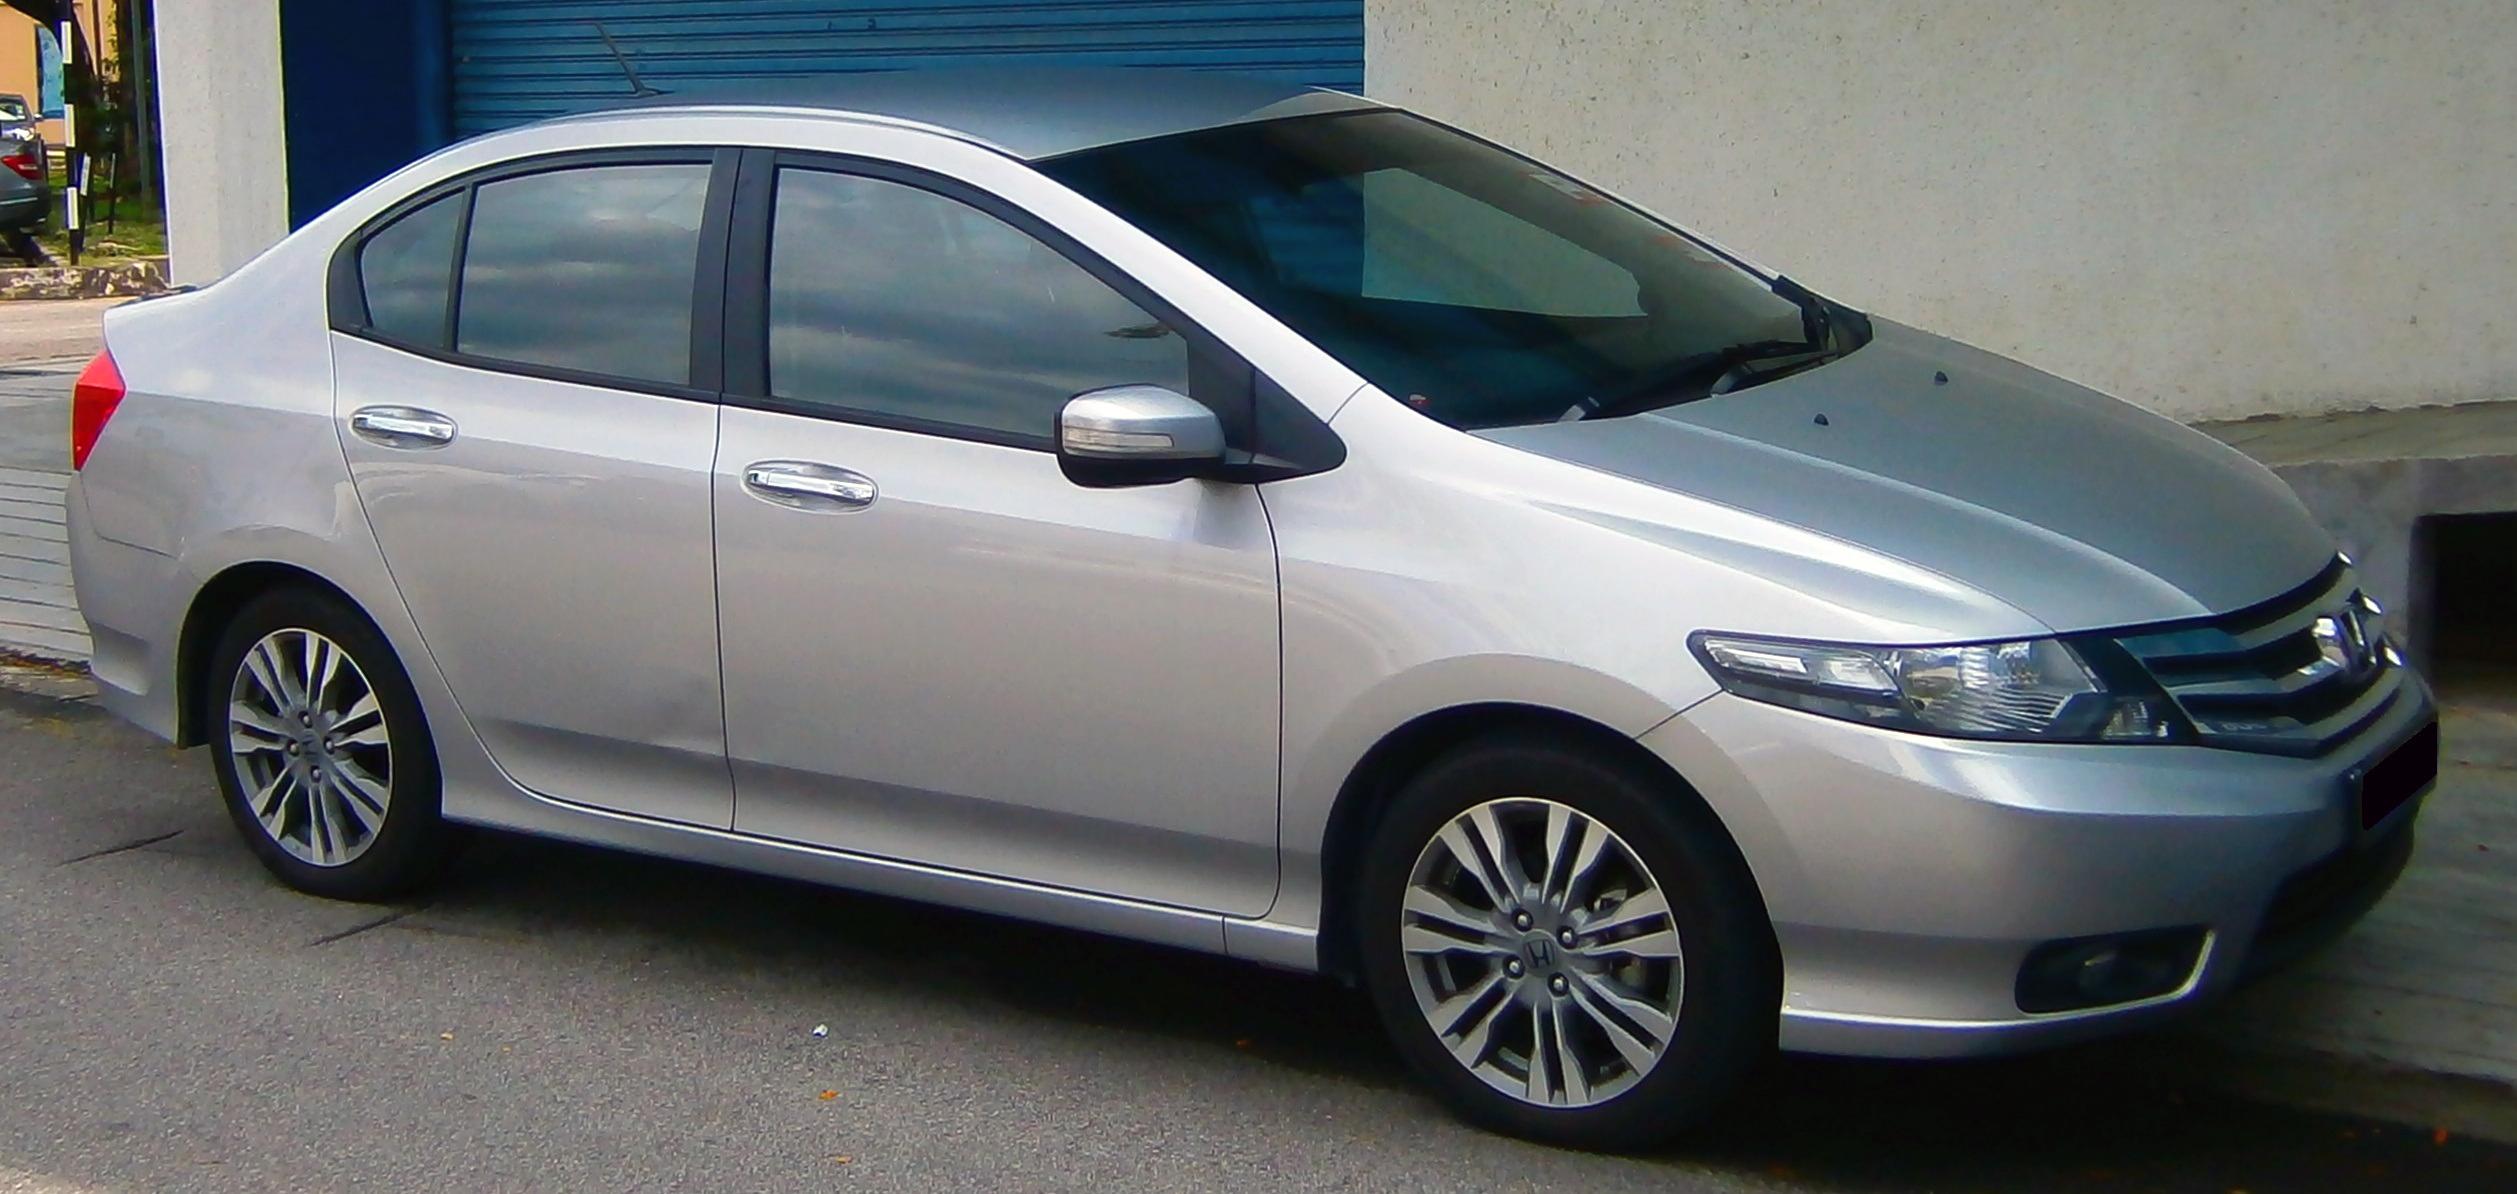 Honda City 2012 Price in Pakistan, Review, Full Specs & Images